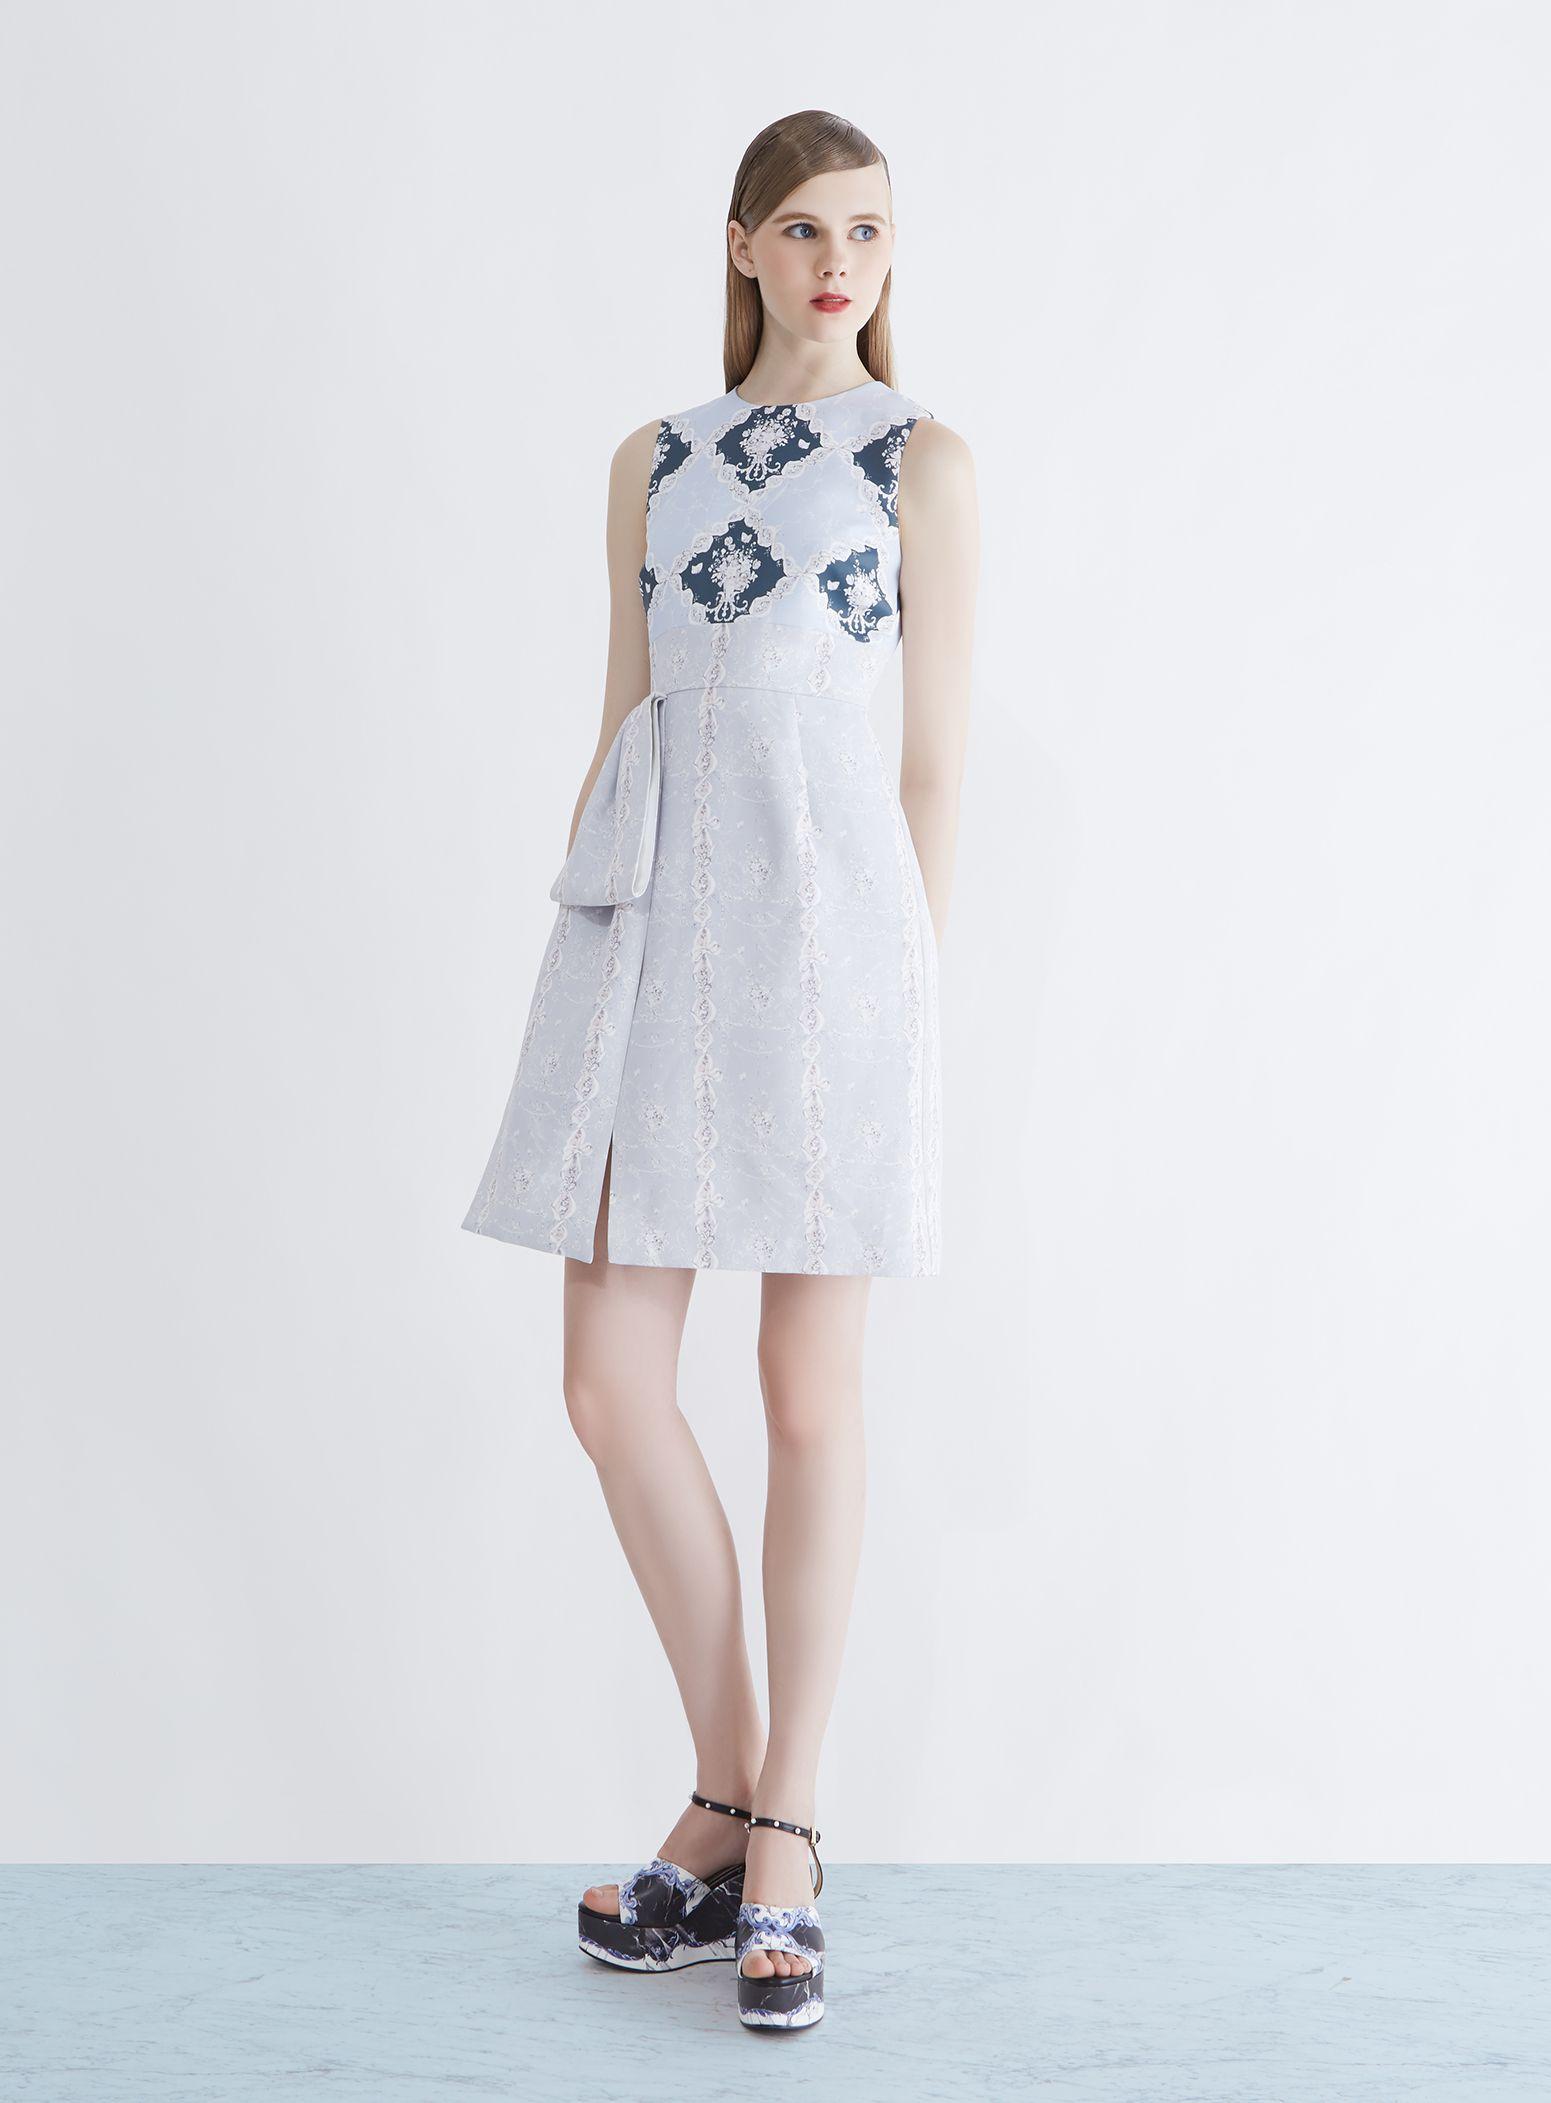 Grid View Wallpaper Sleeveless Dress